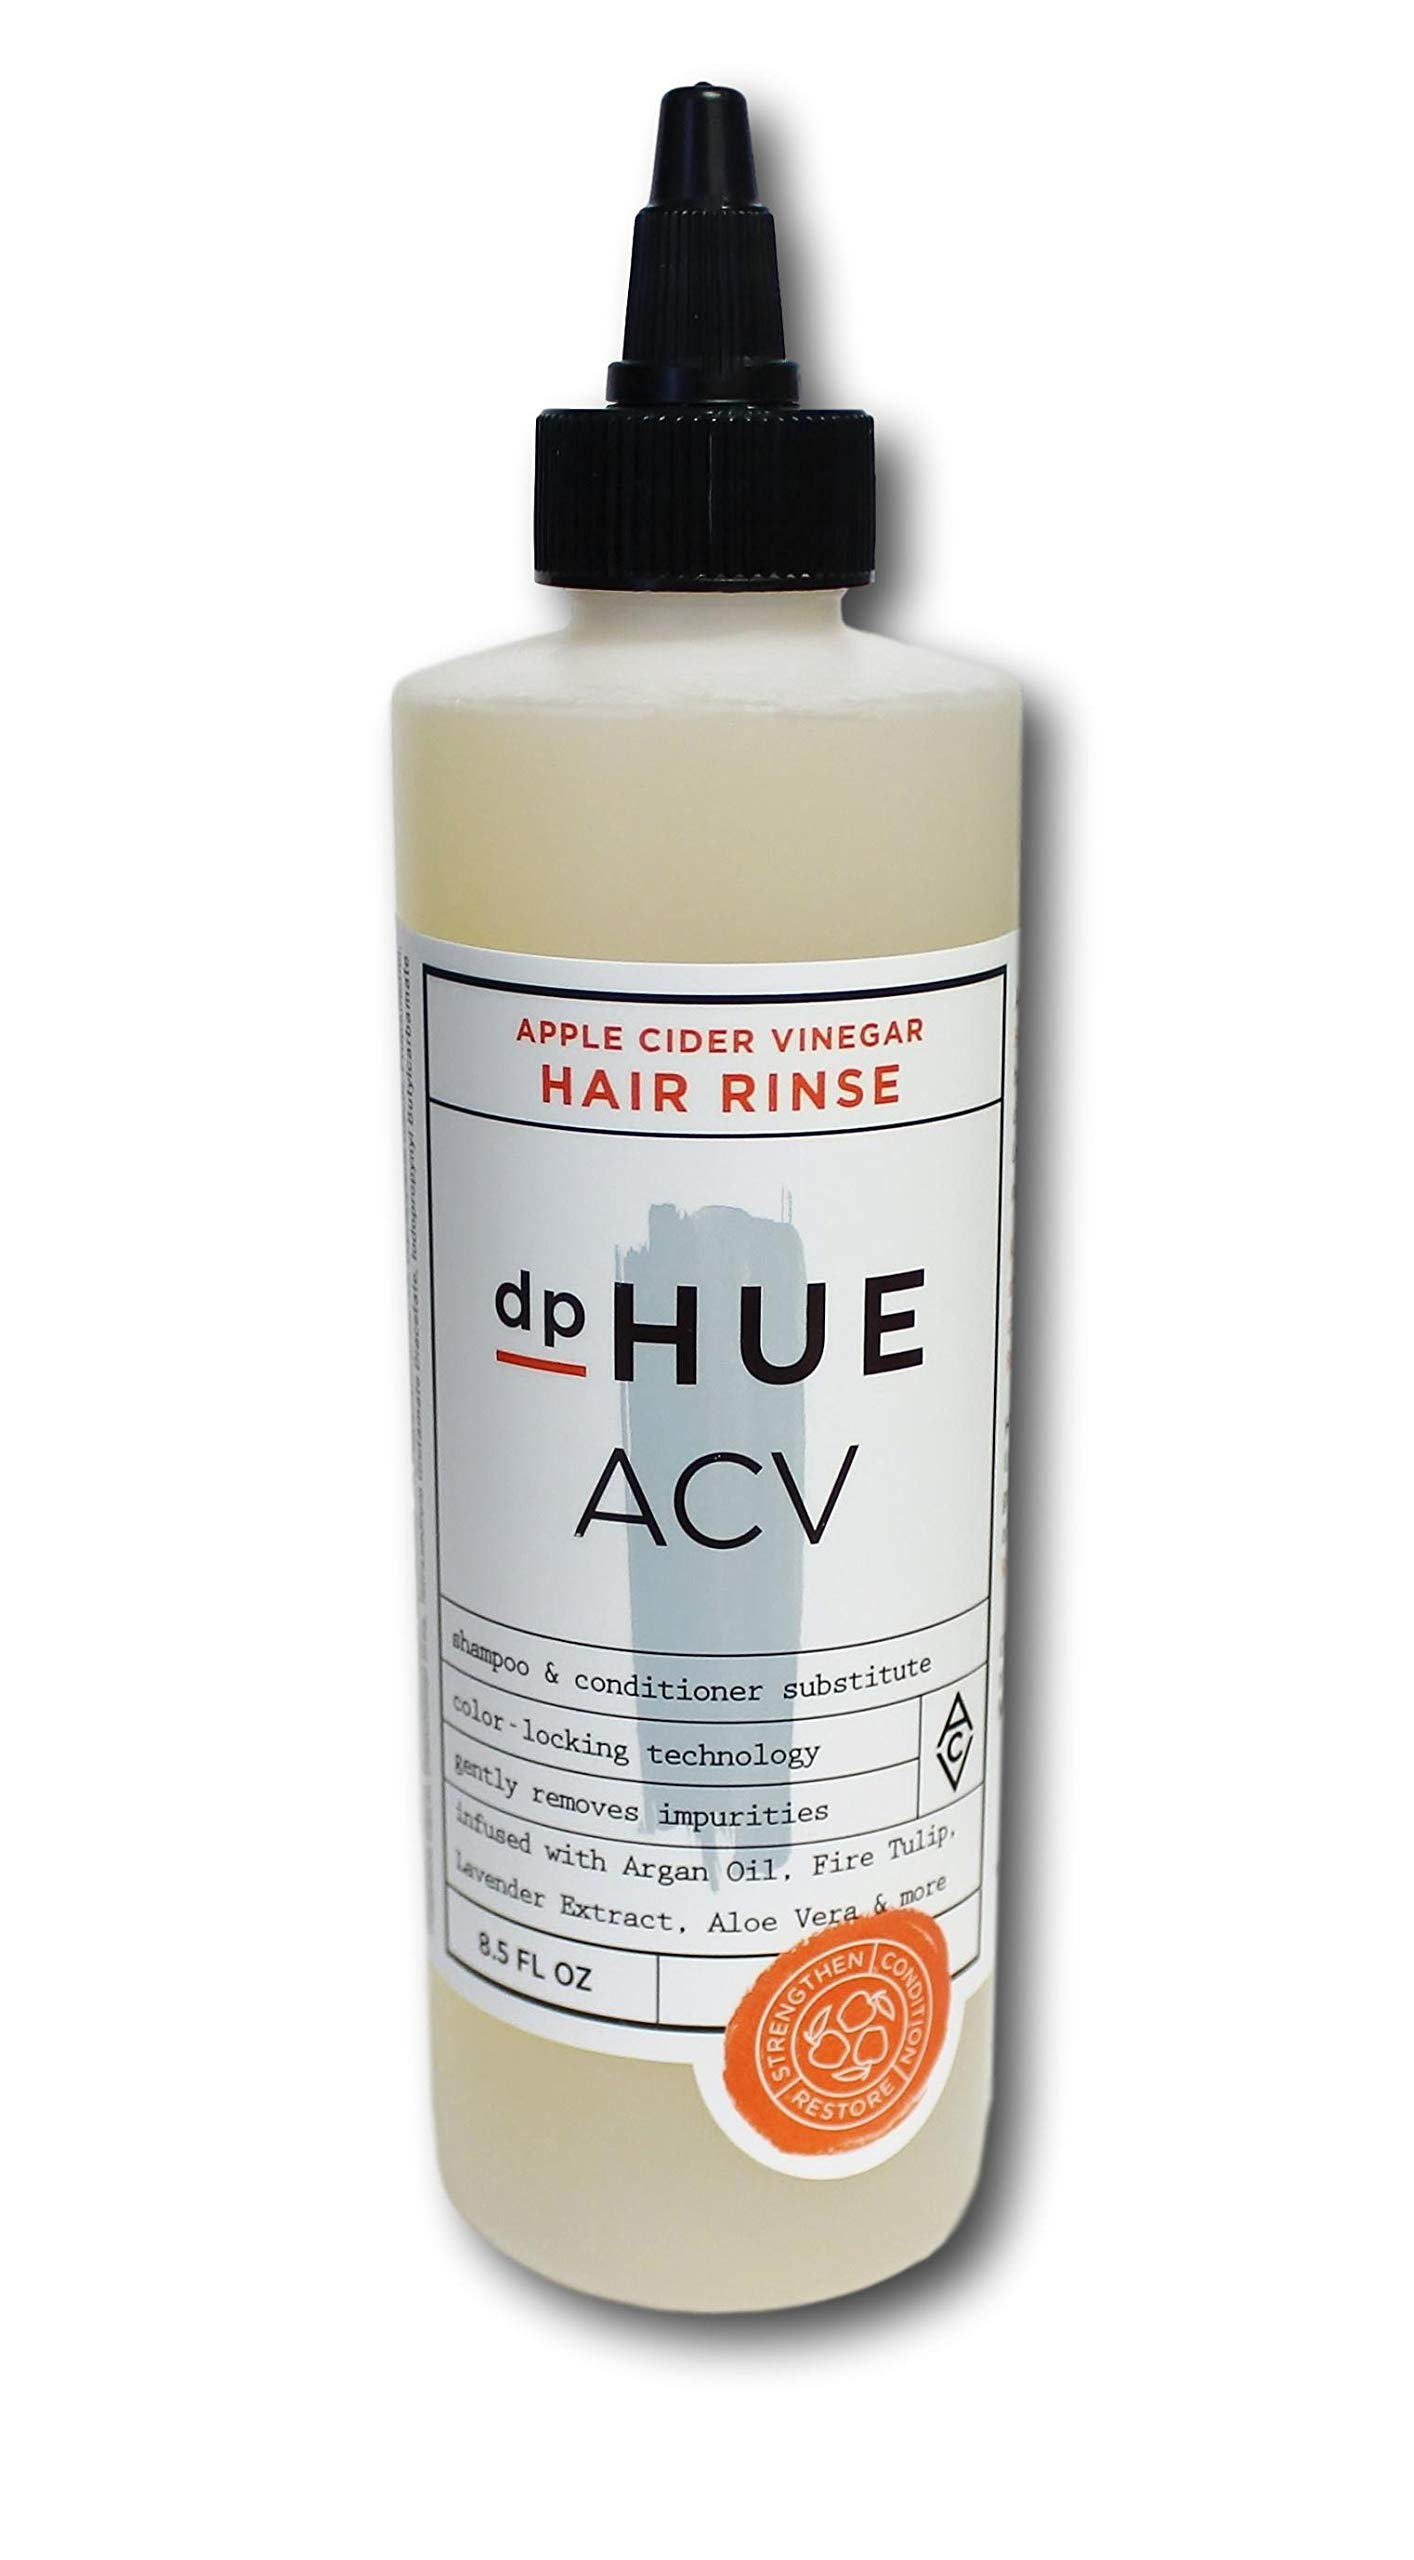 Dphue Apple Cider Vinegar Hair Rinse 8.5 Oz Rinse, 8.5 Oz